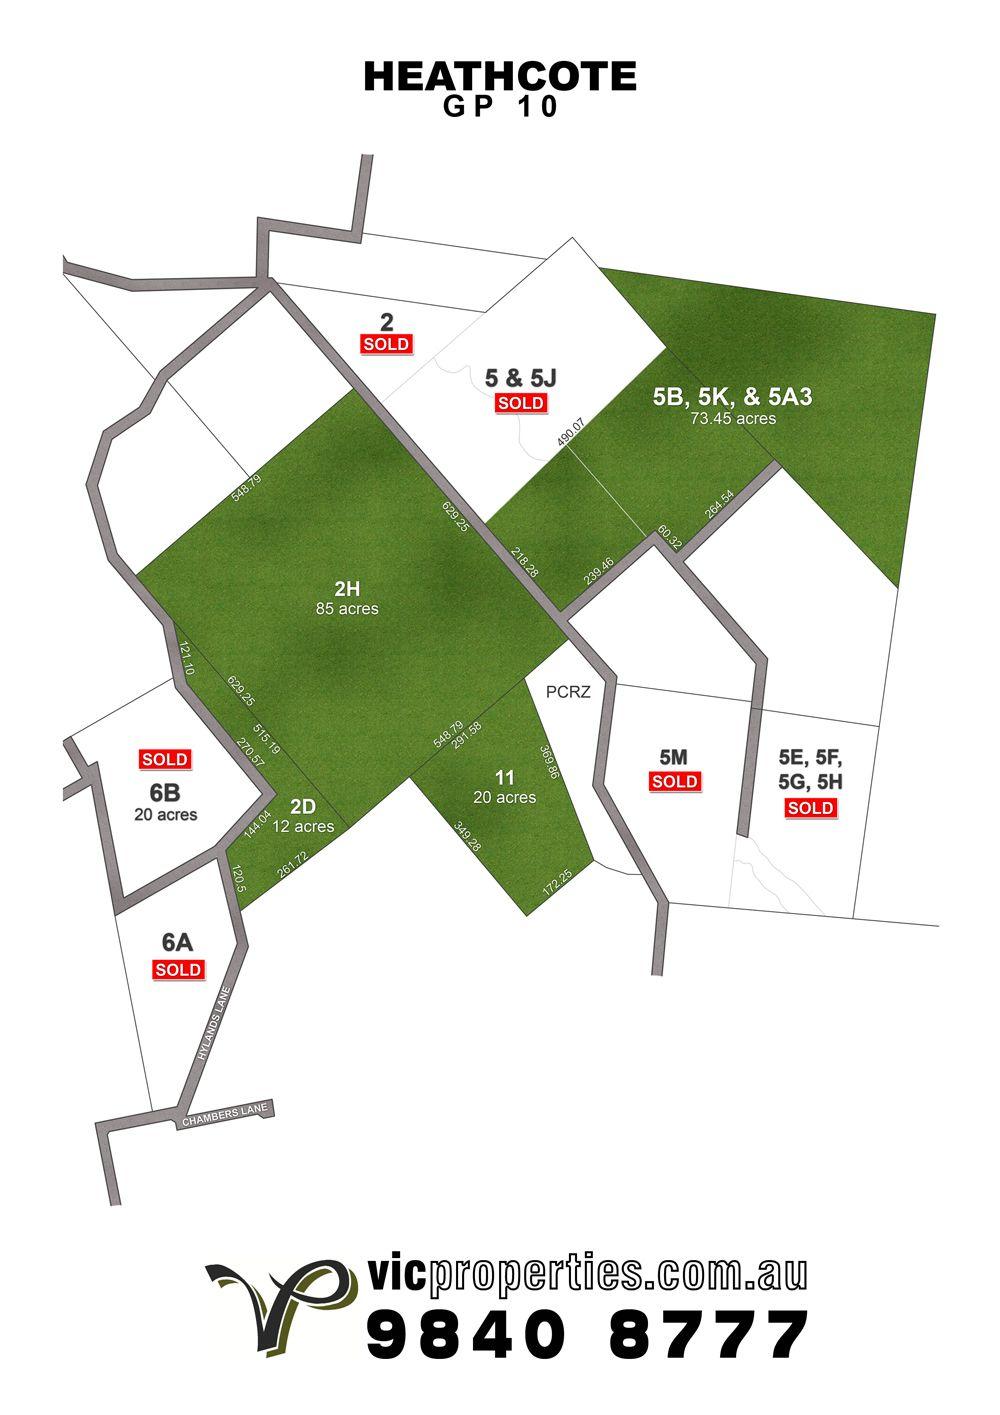 Lot 2H/ Hylands Lane, Heathcote VIC 3523